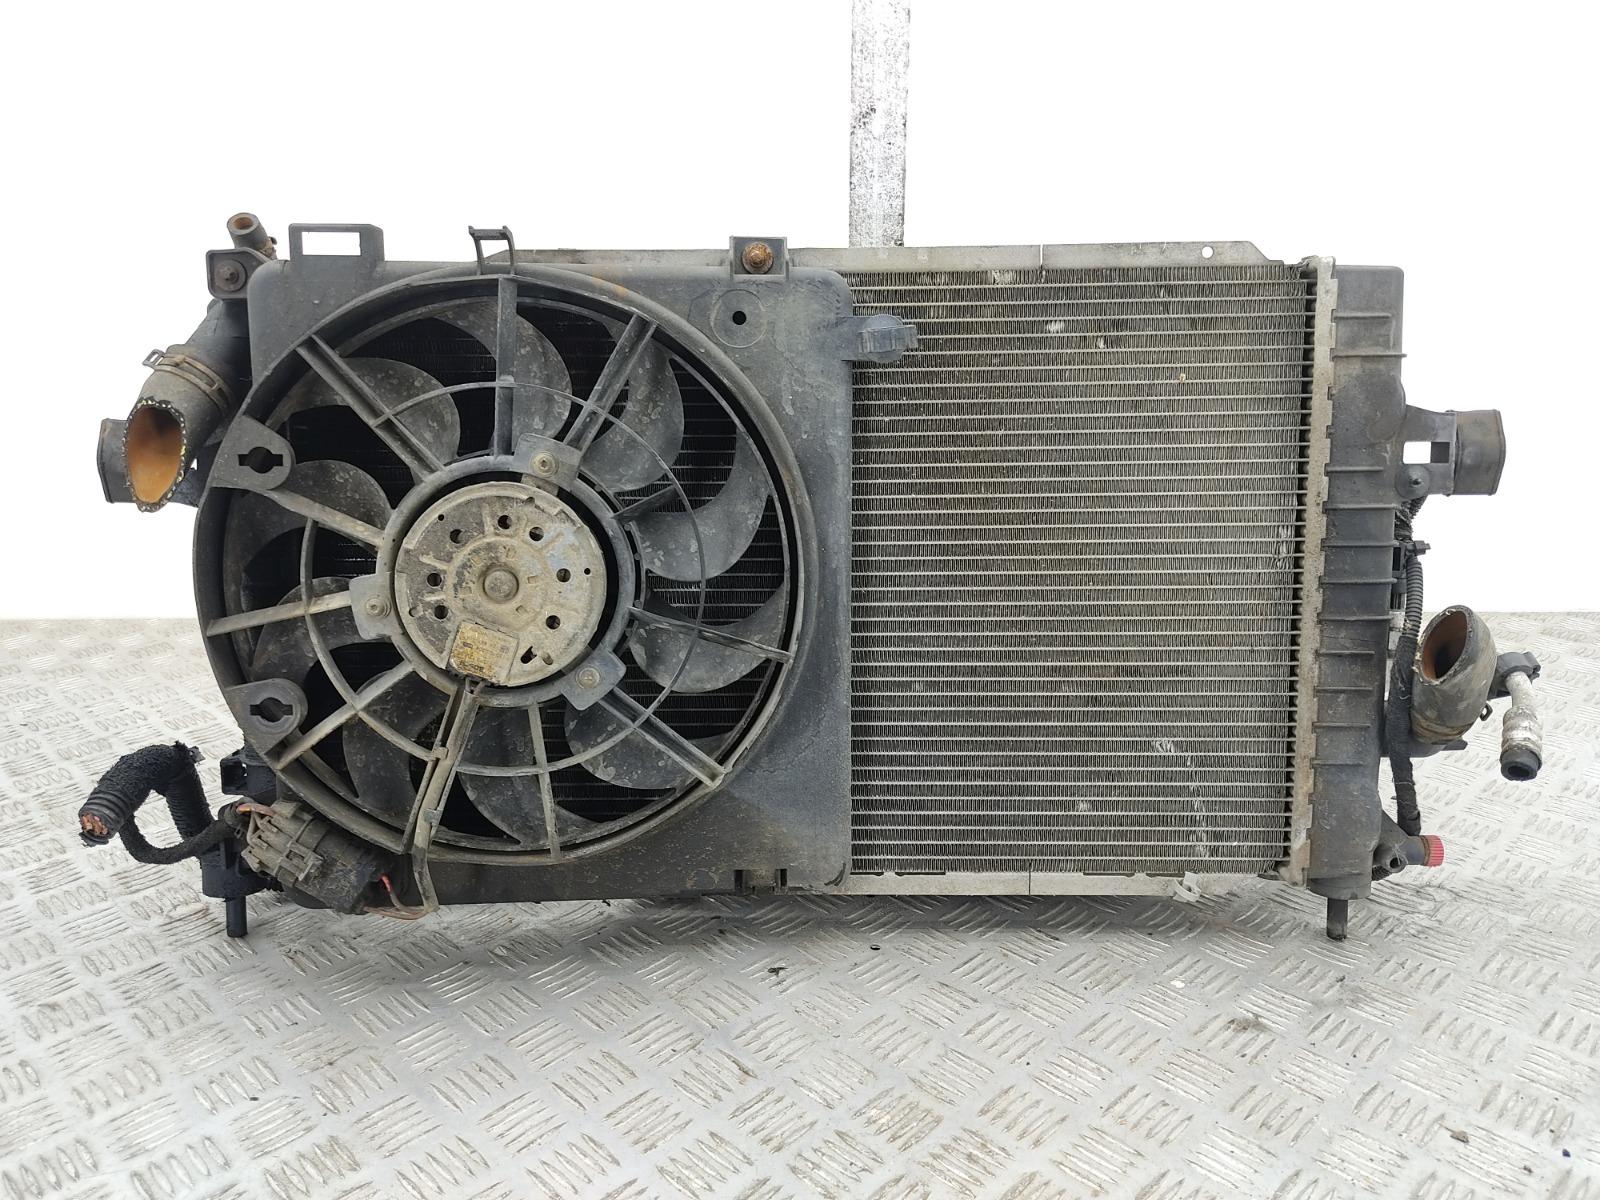 Кассета радиаторов Opel Astra H 1.3 CDTI 2007 (б/у)